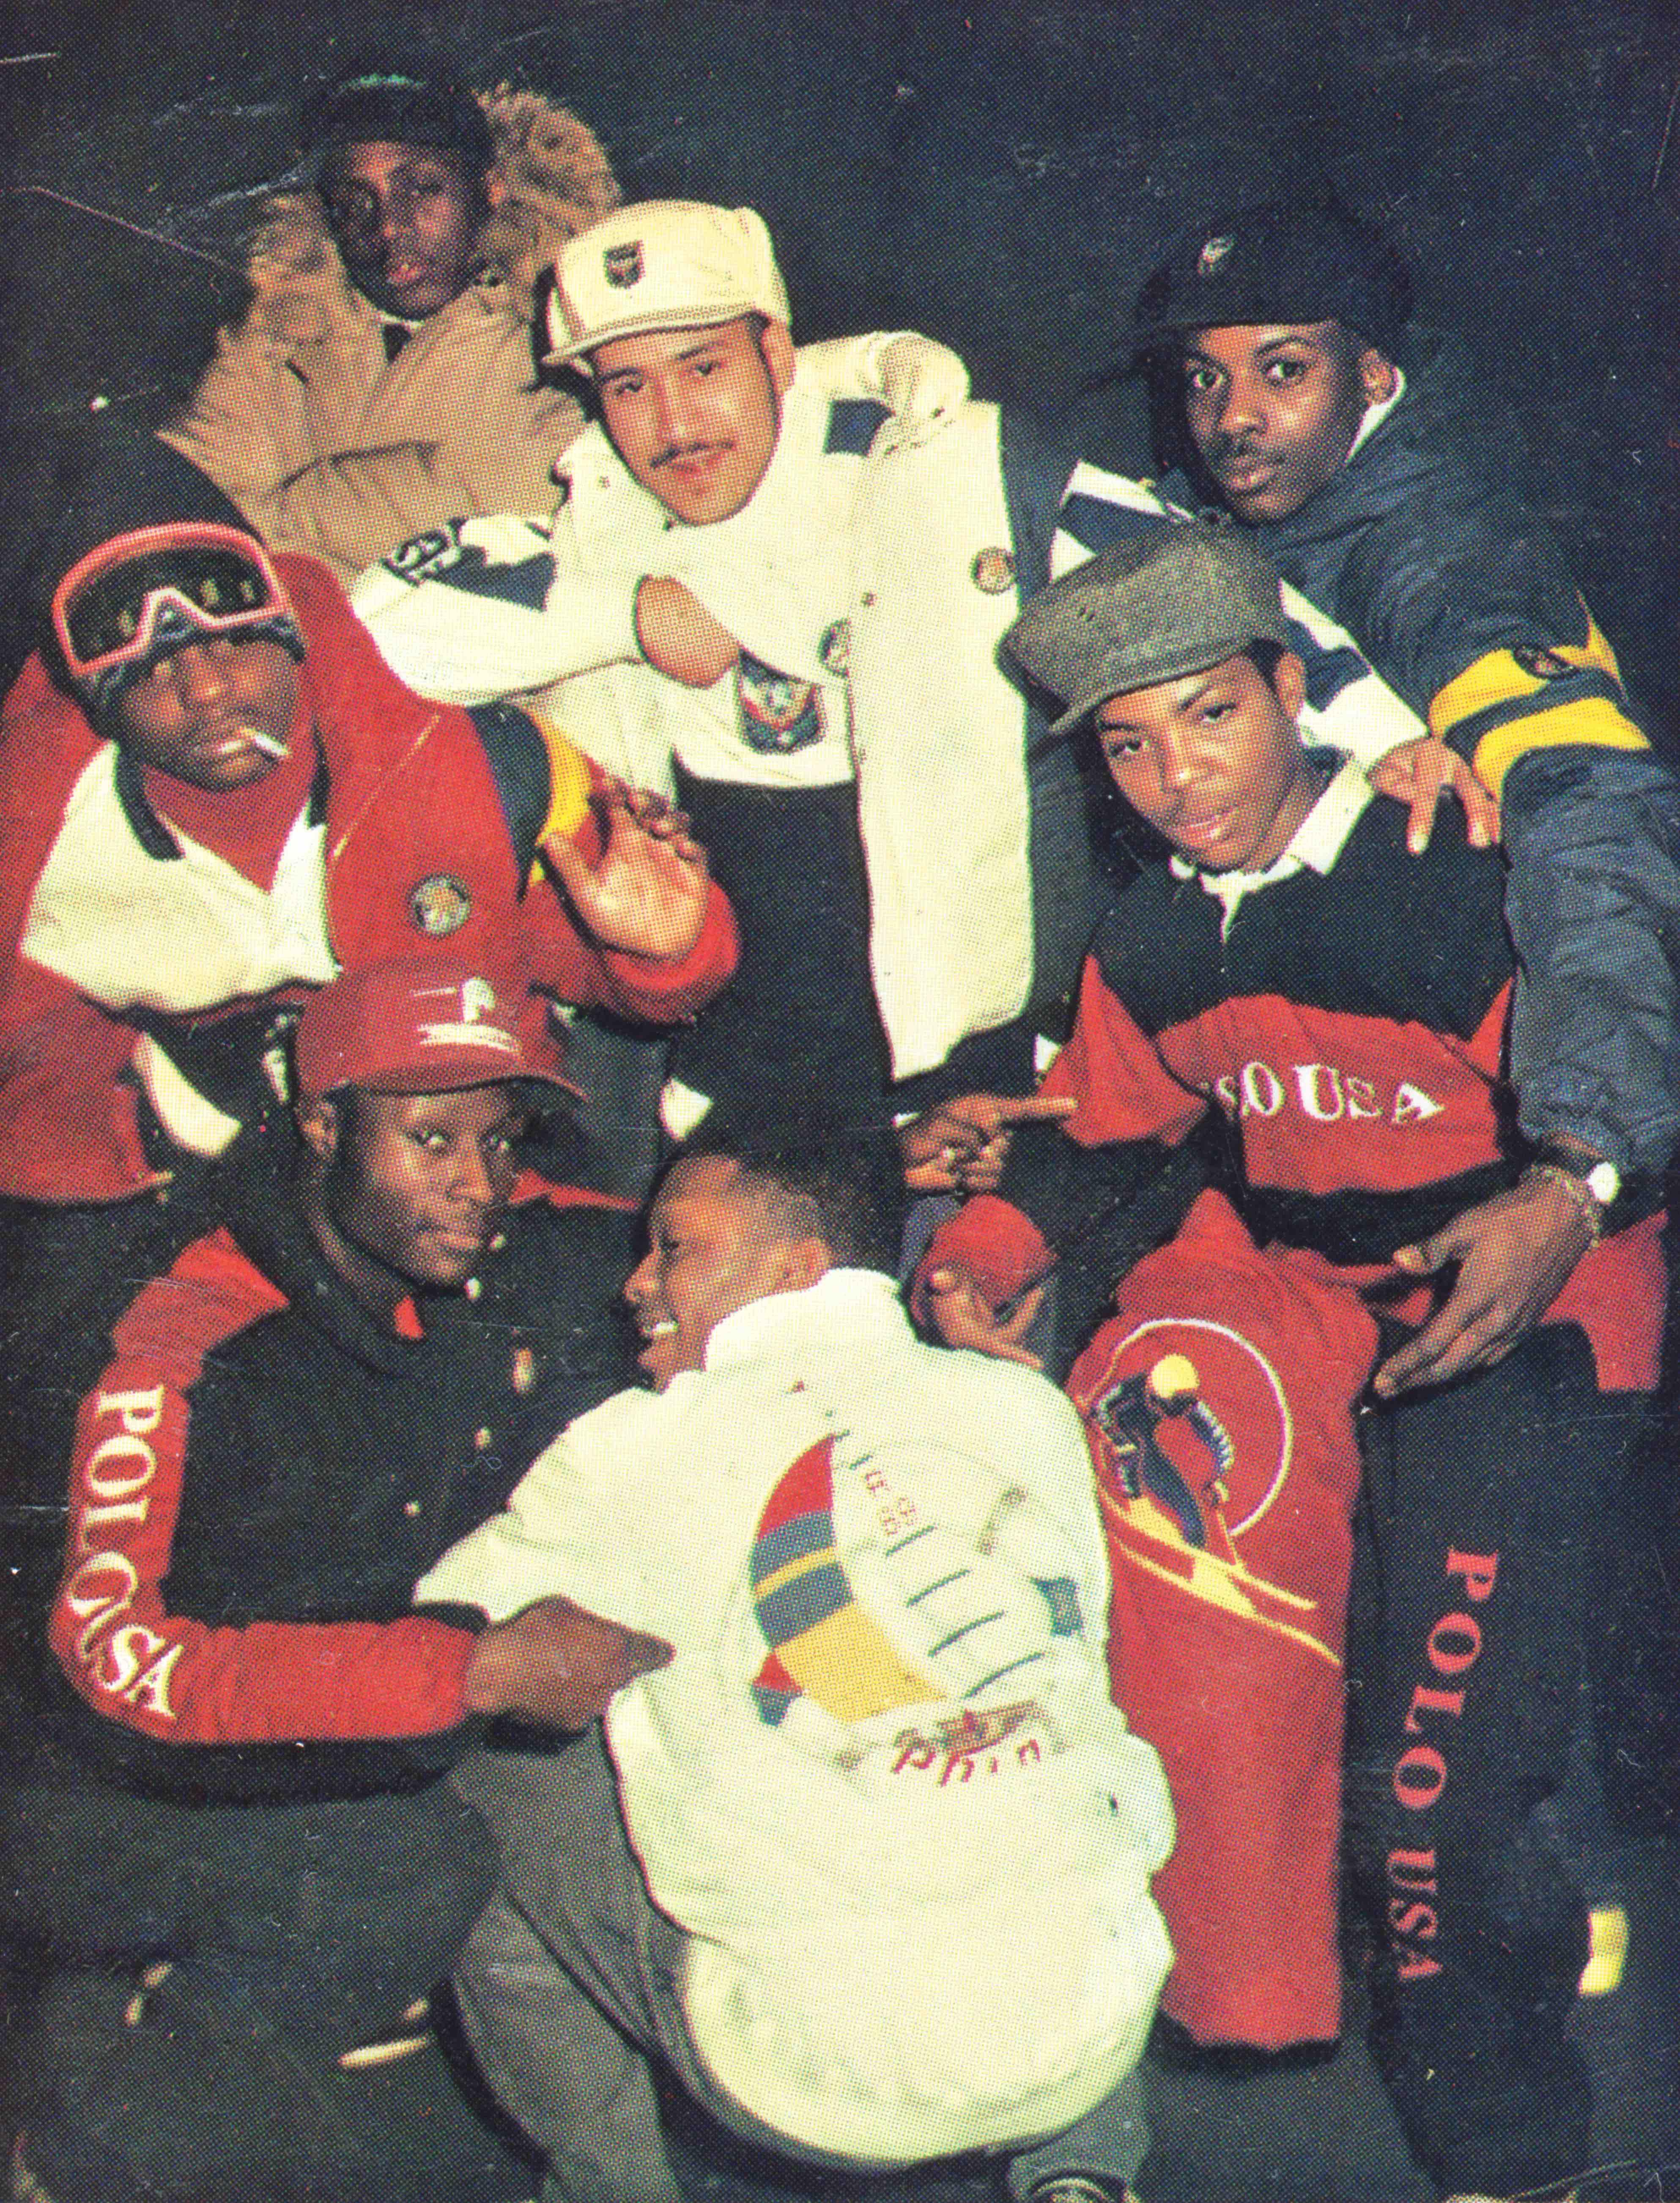 Inside the best dressed gang of 1980s New York